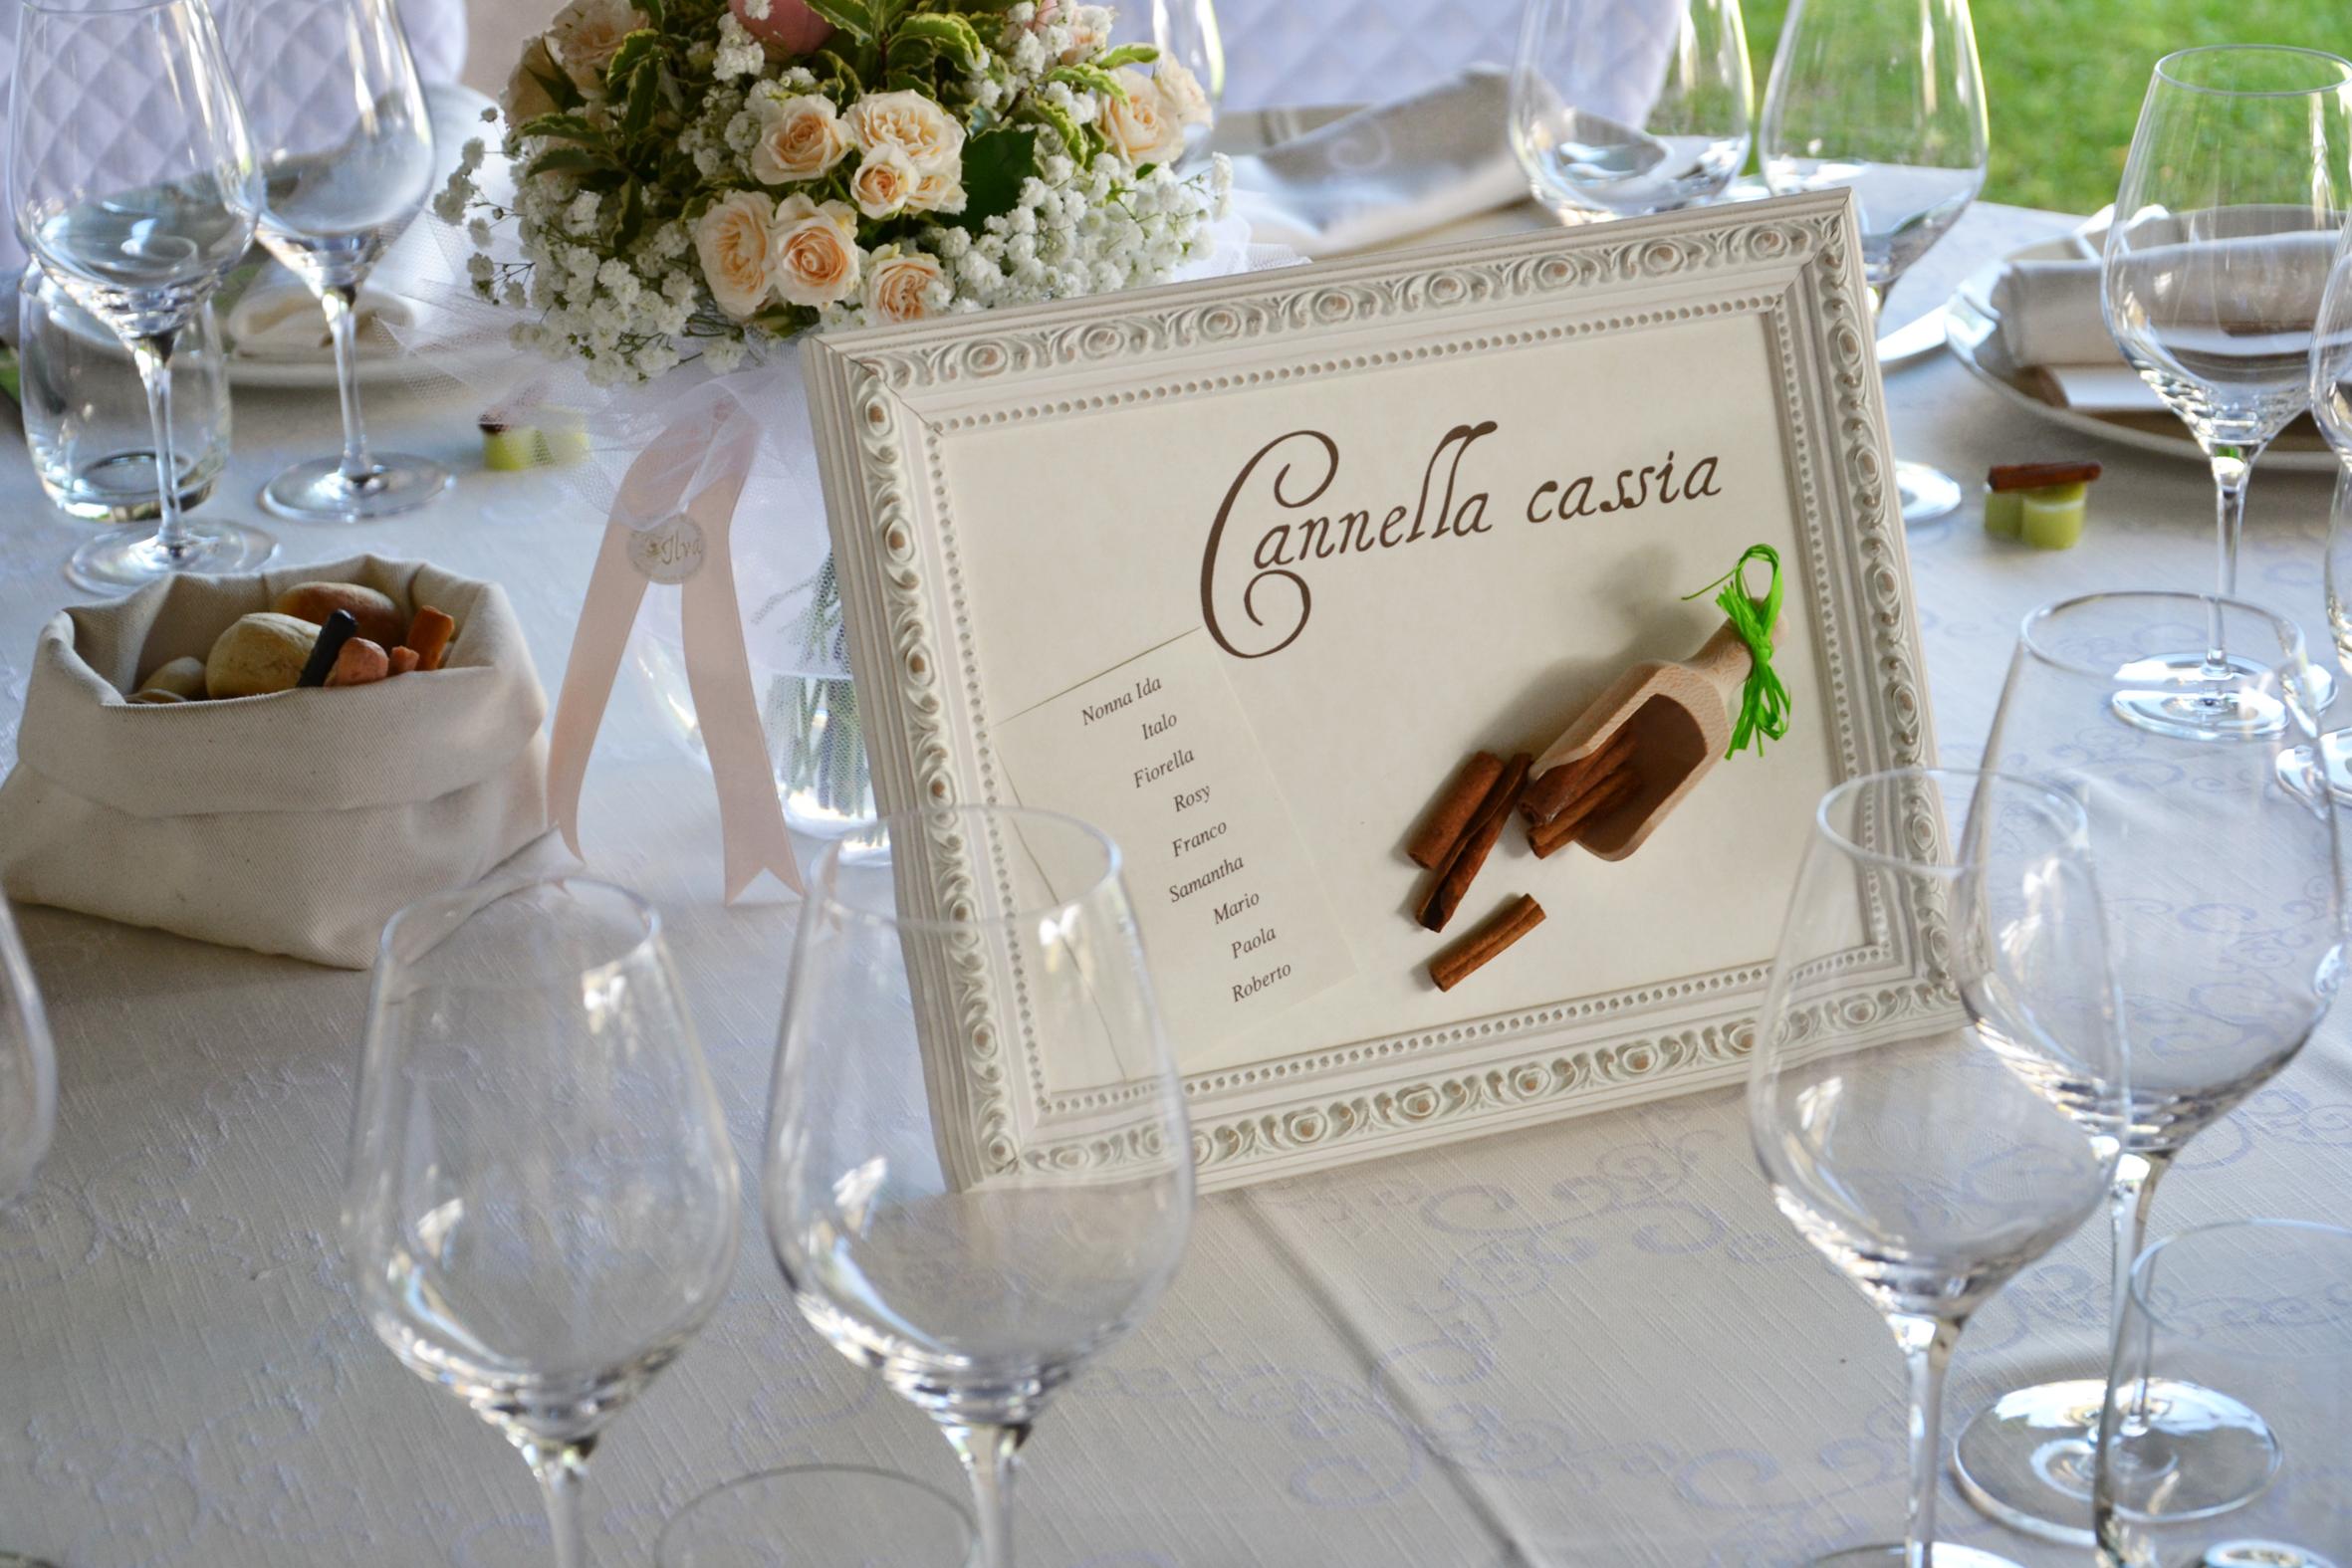 Matrimonio Tema Infusi : Un allestimento speziale! orodorienthe